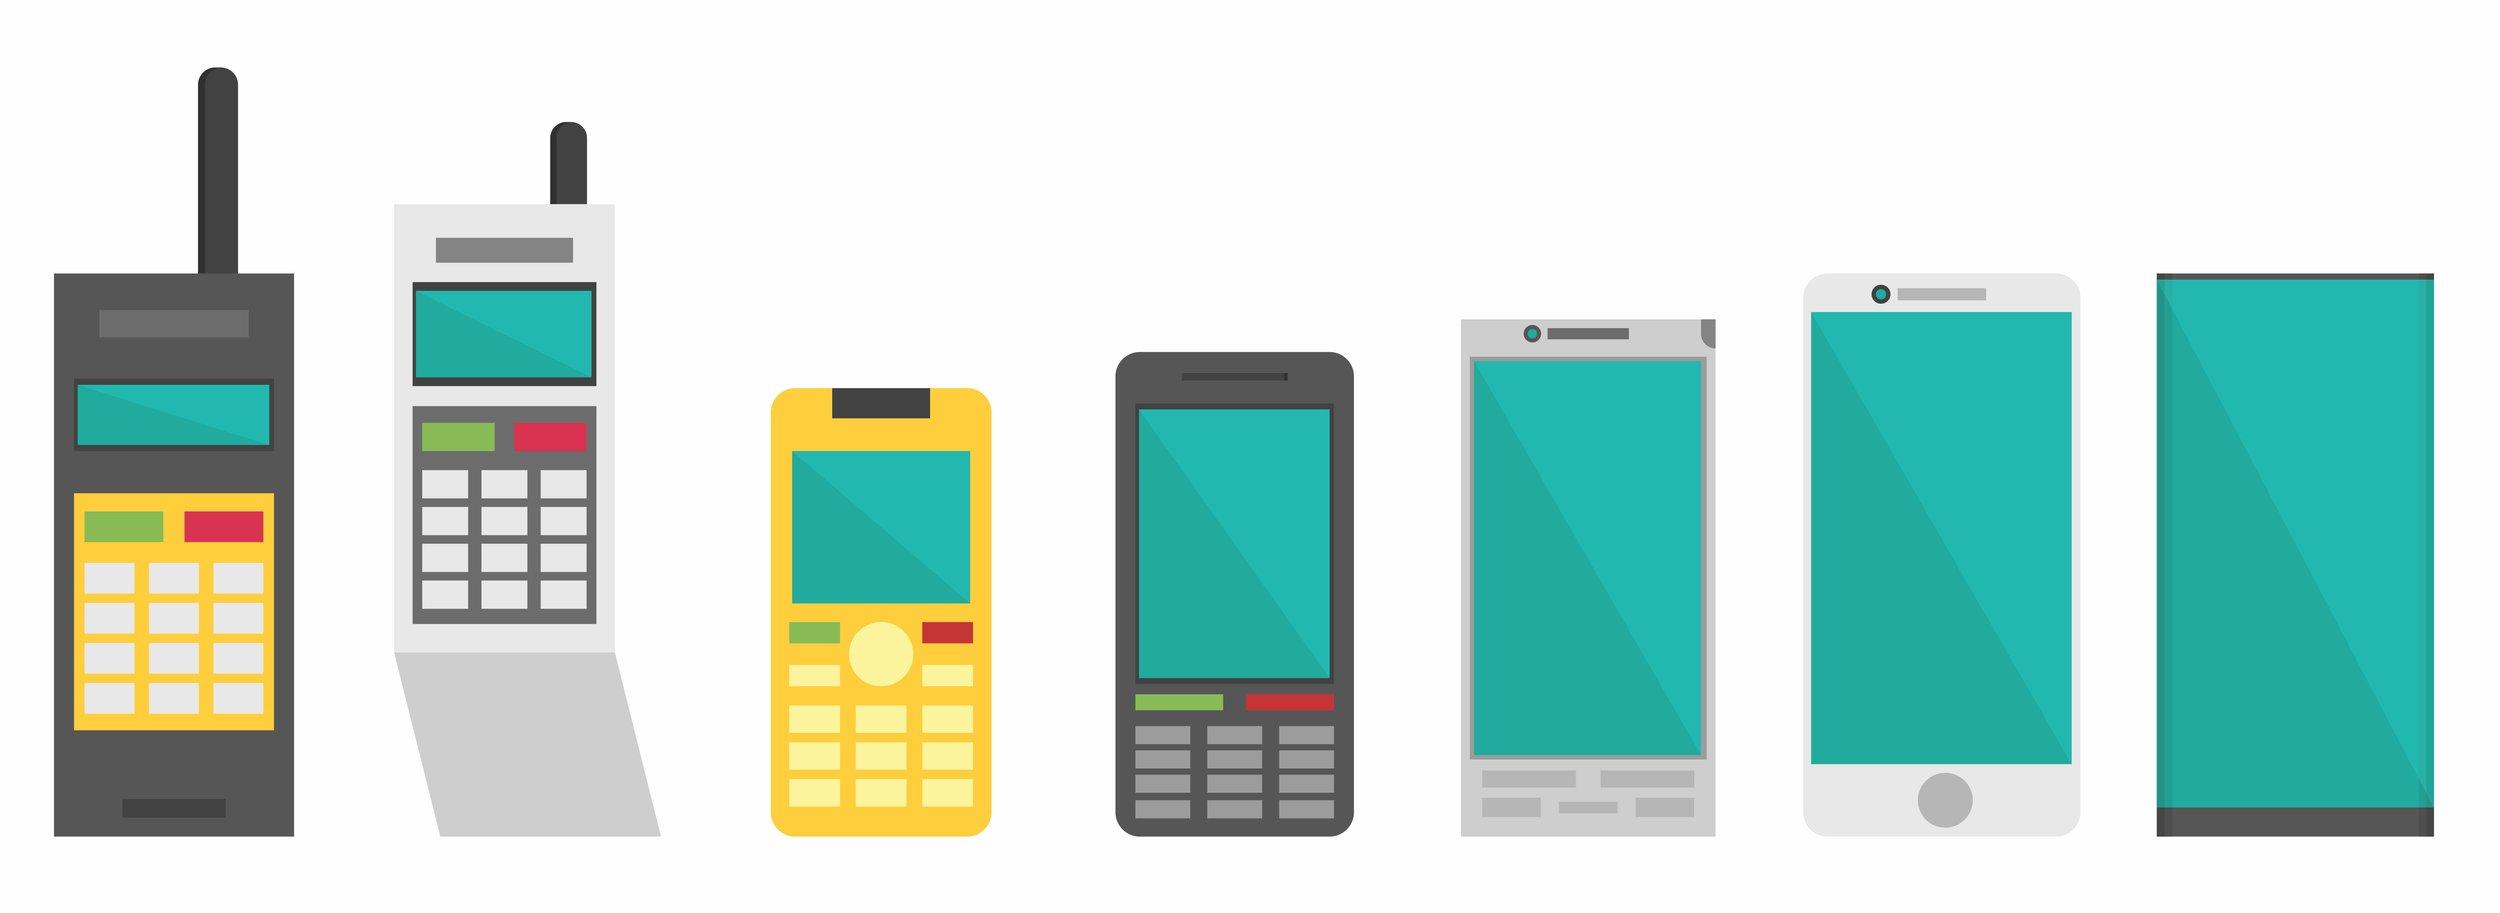 phone-design-2.jpg